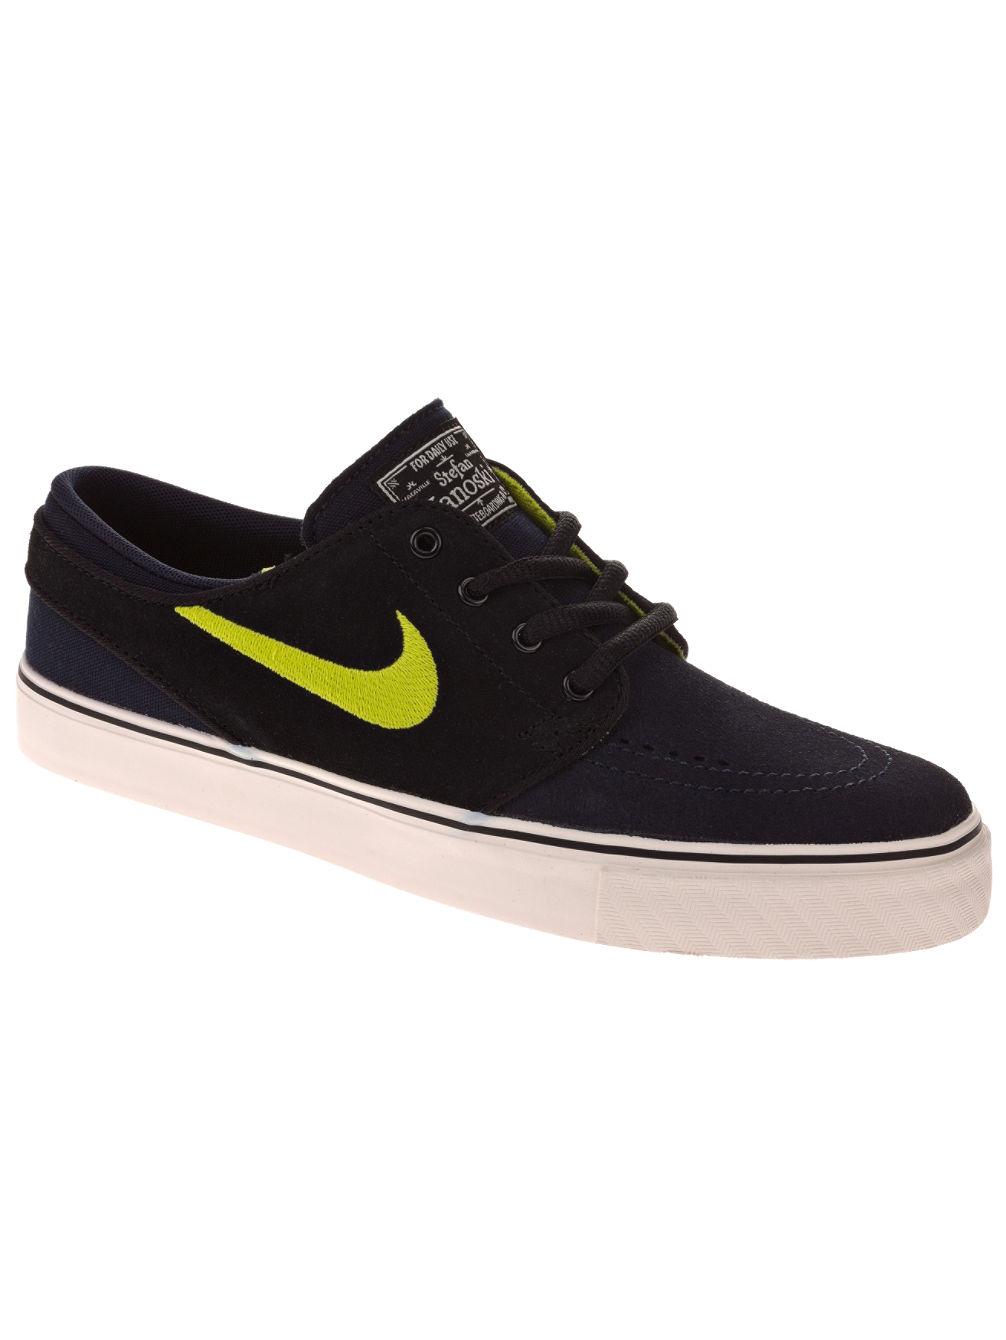 Nike Stefan Janoski (GS) Skate Shoes Boys - nike - blue-tomato.com